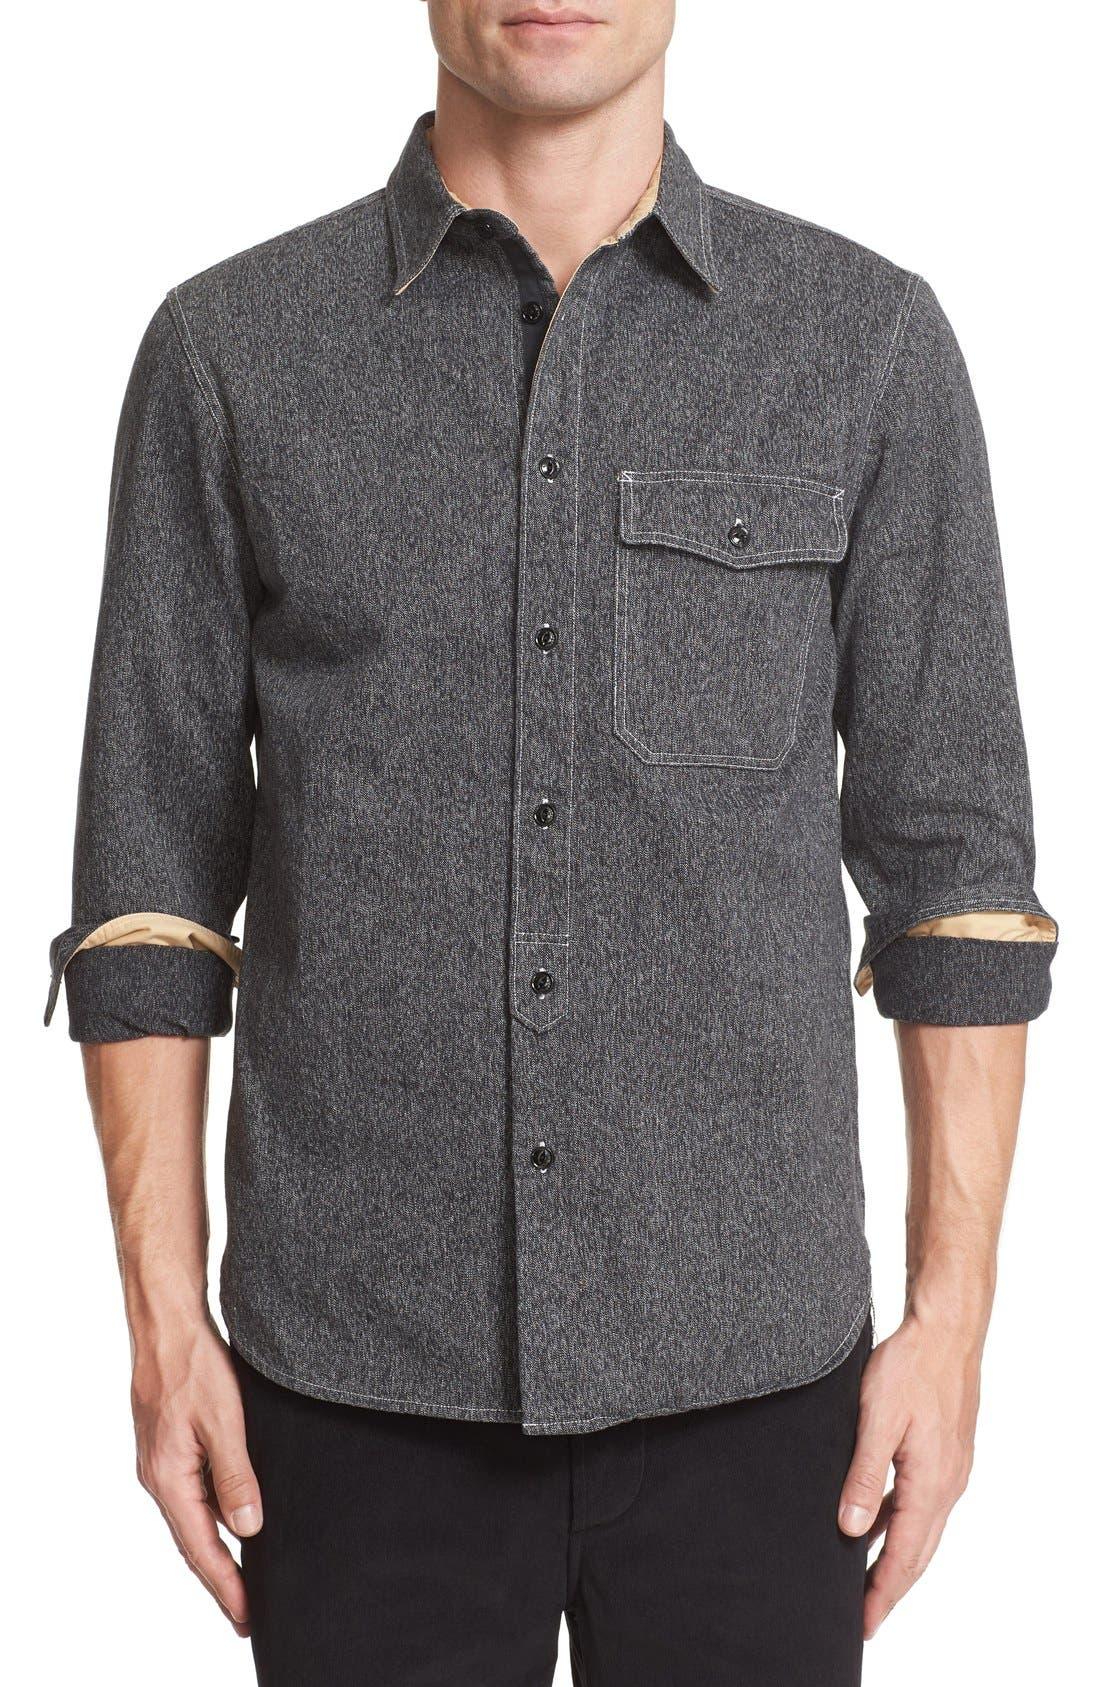 RAG & BONE CPO Woven Cotton Shirt